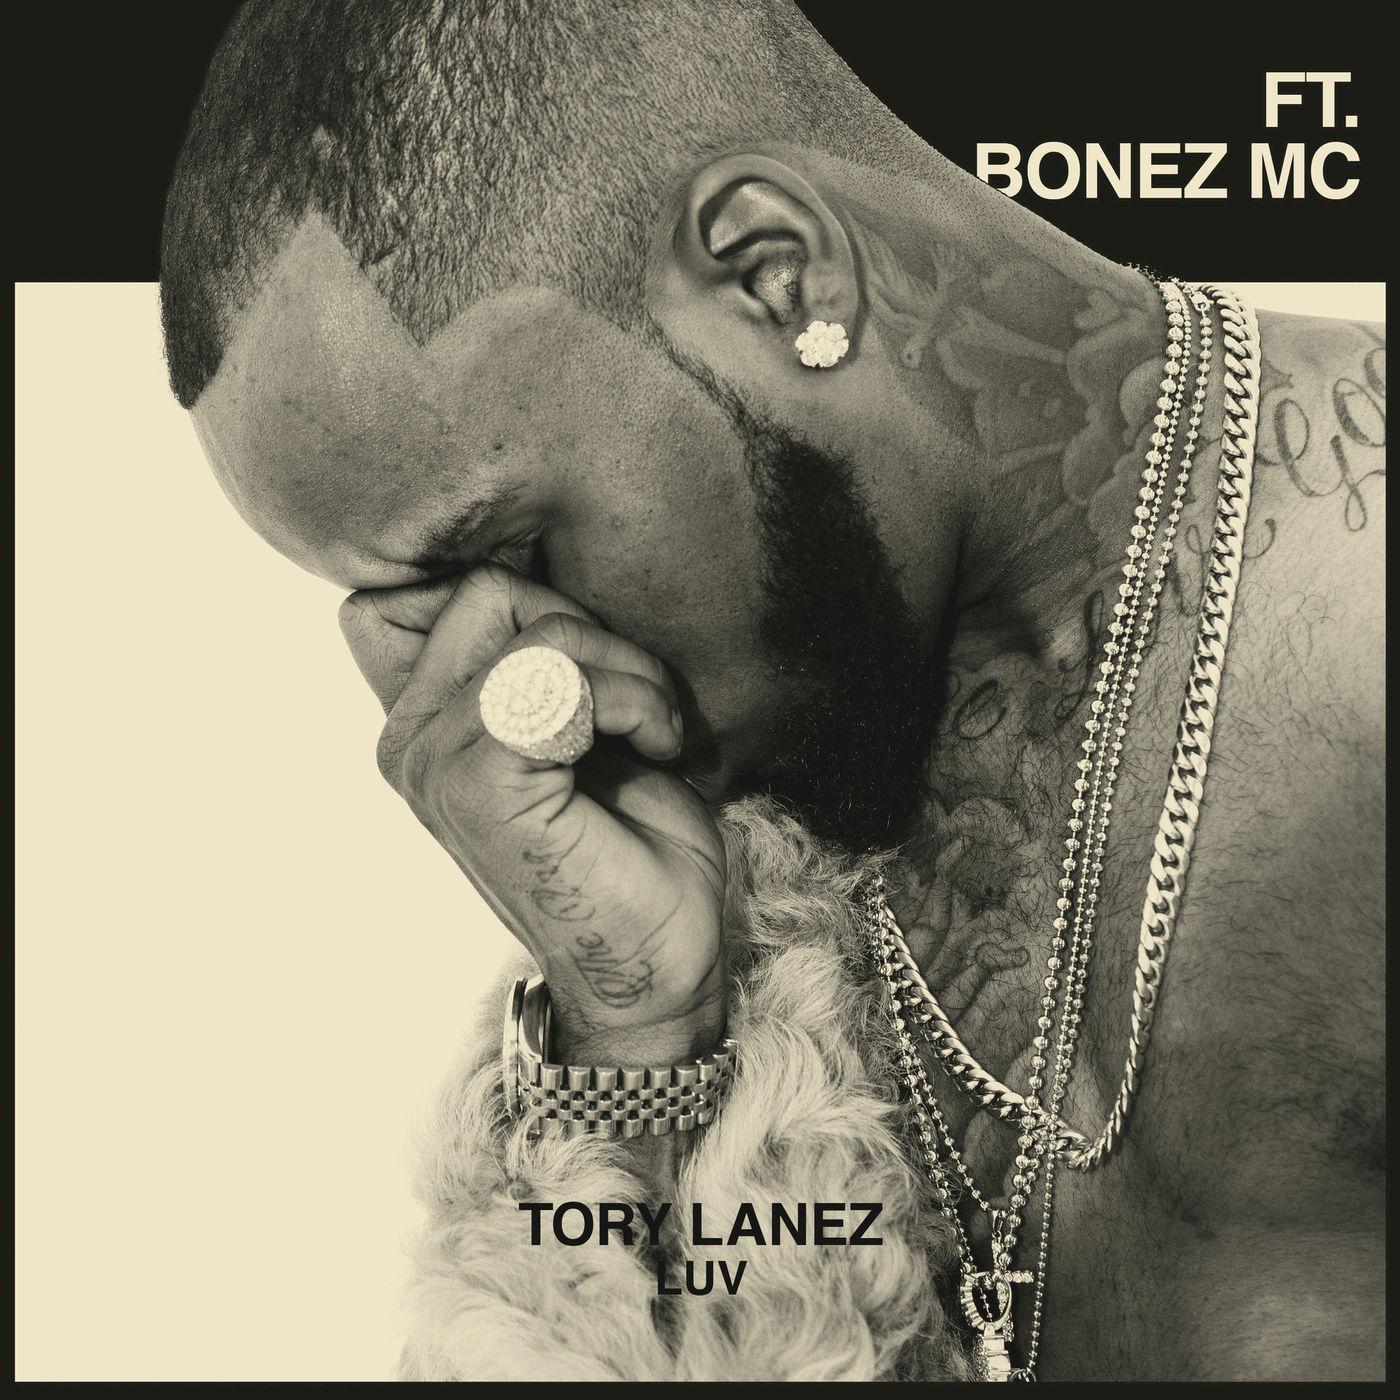 Tory Lanez - Luv (feat. Bonez MC) - Single Cover